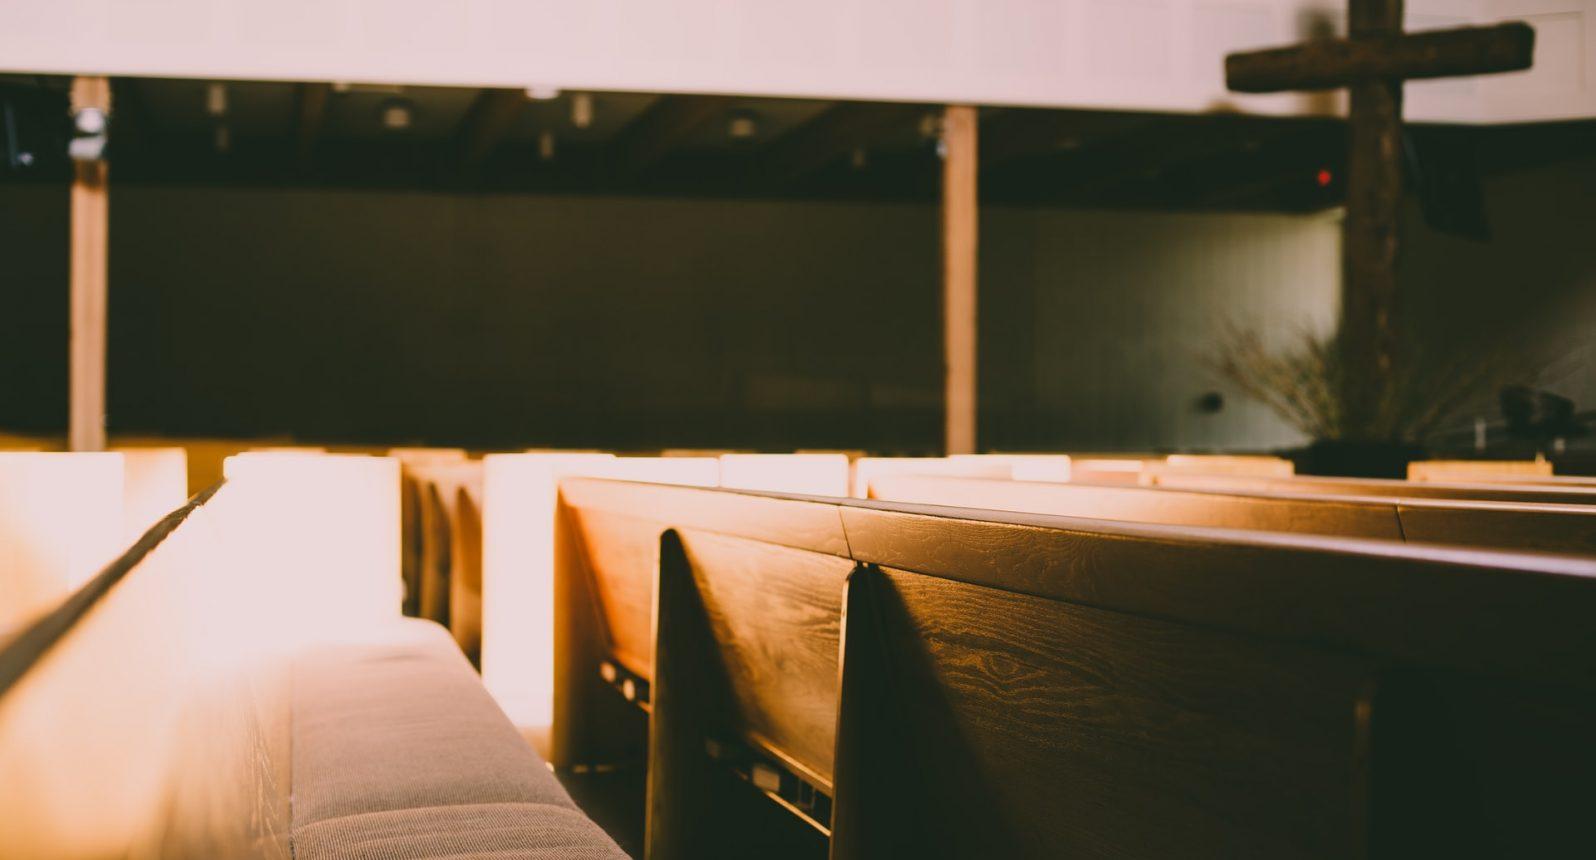 Bancos em uma igreja. Foto de Gregory Hayes